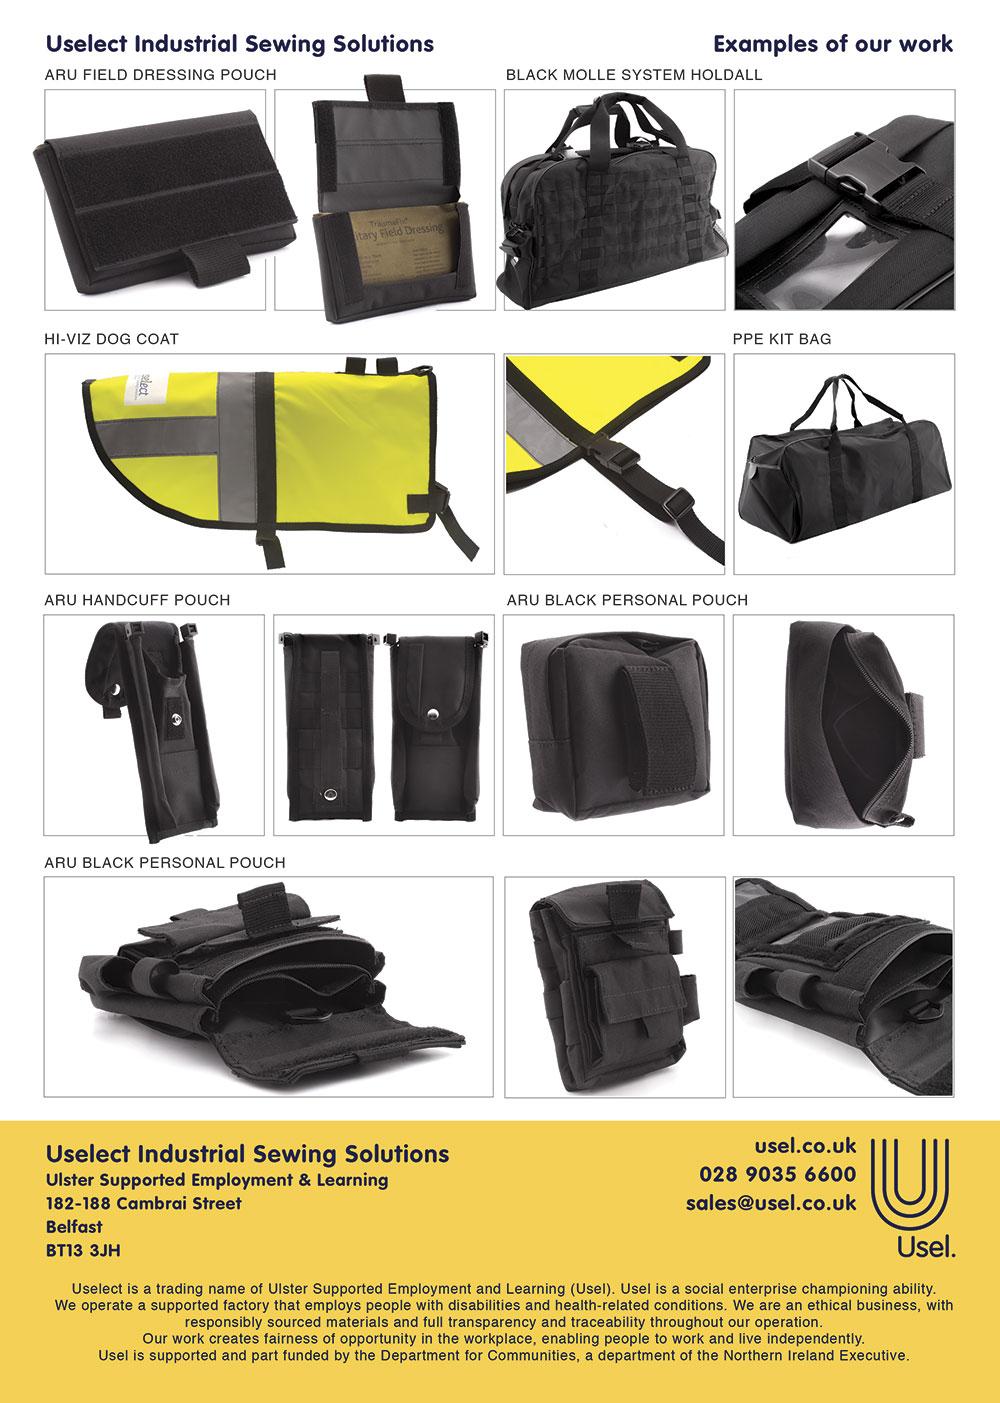 usel-brochure-example-2.jpg